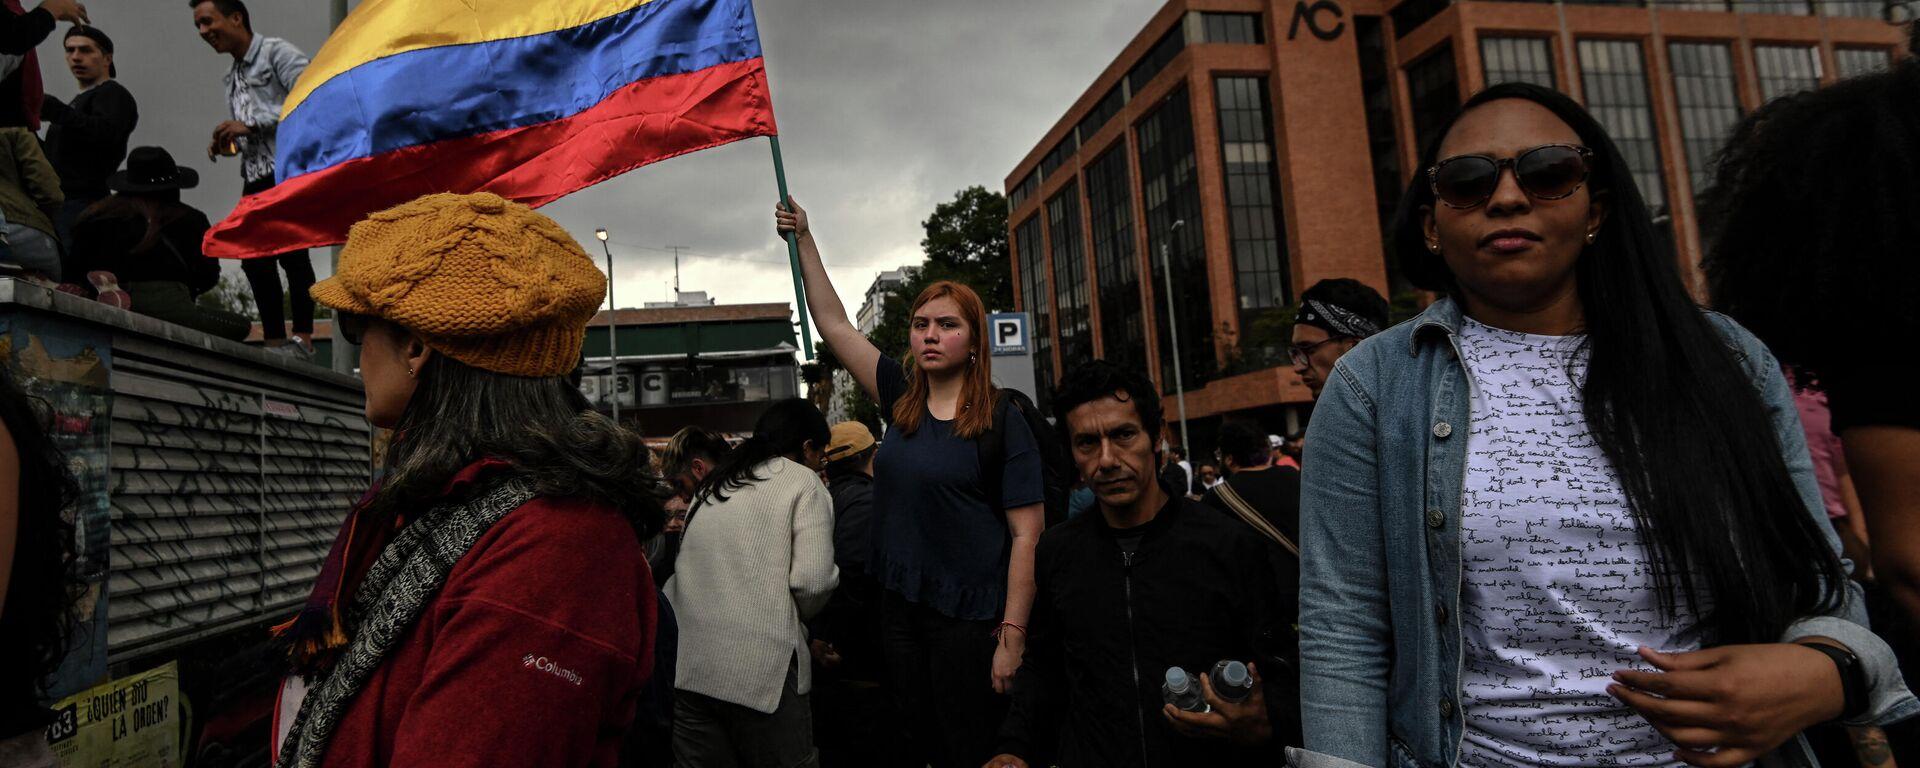 Protestas en Bogotá, Colombia - Sputnik Mundo, 1920, 10.05.2021